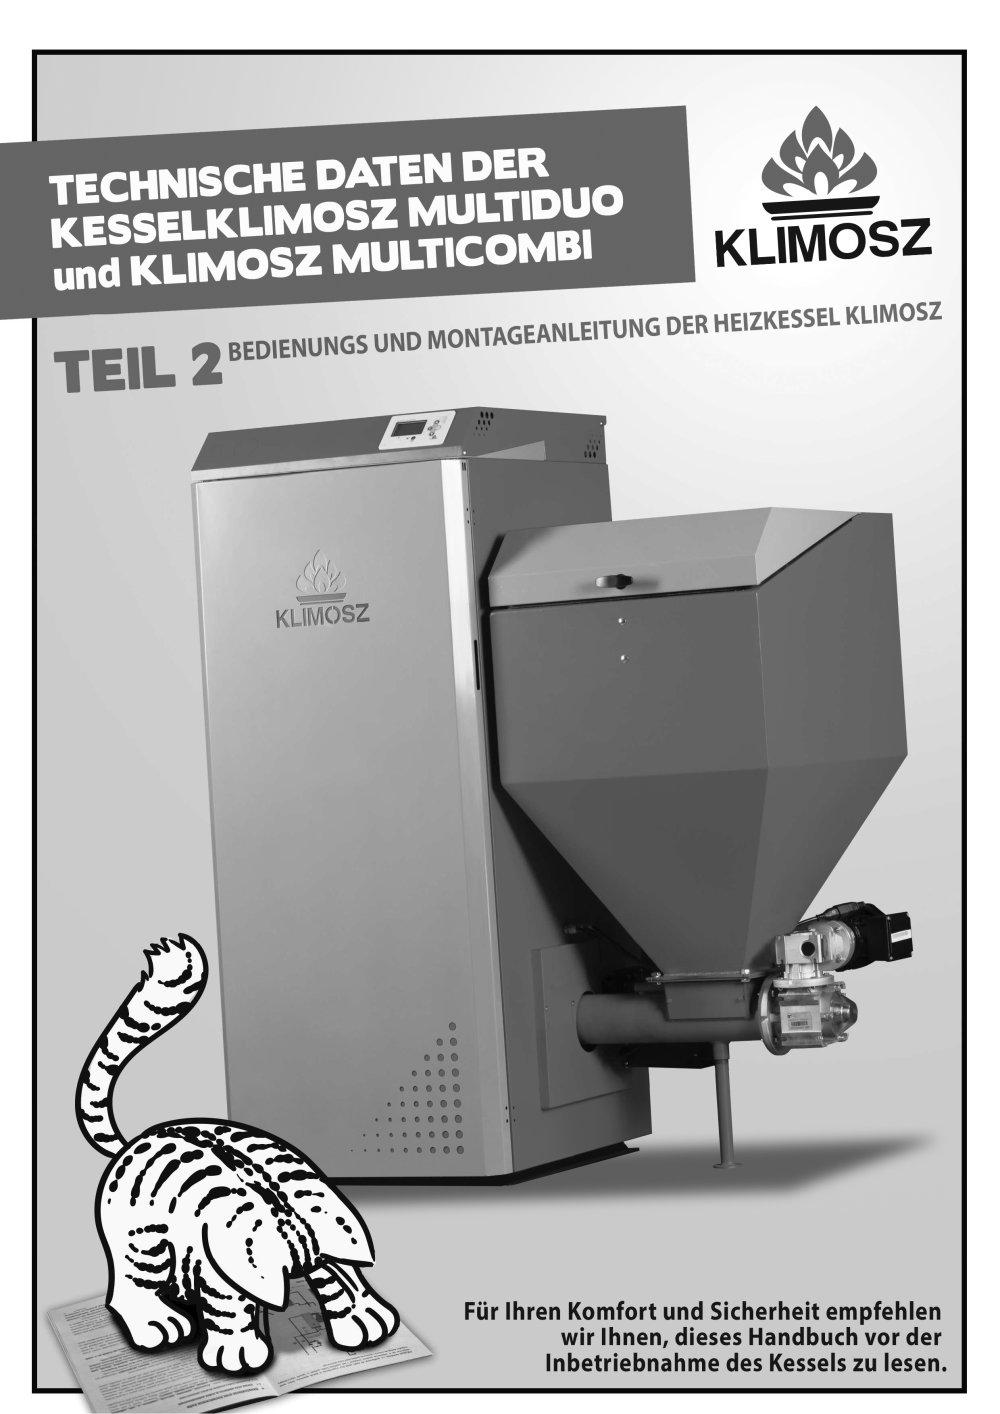 KLIMOSZ MULTIDUO - Klimosz - PDF Katalog | Beschreibung | Prospekt